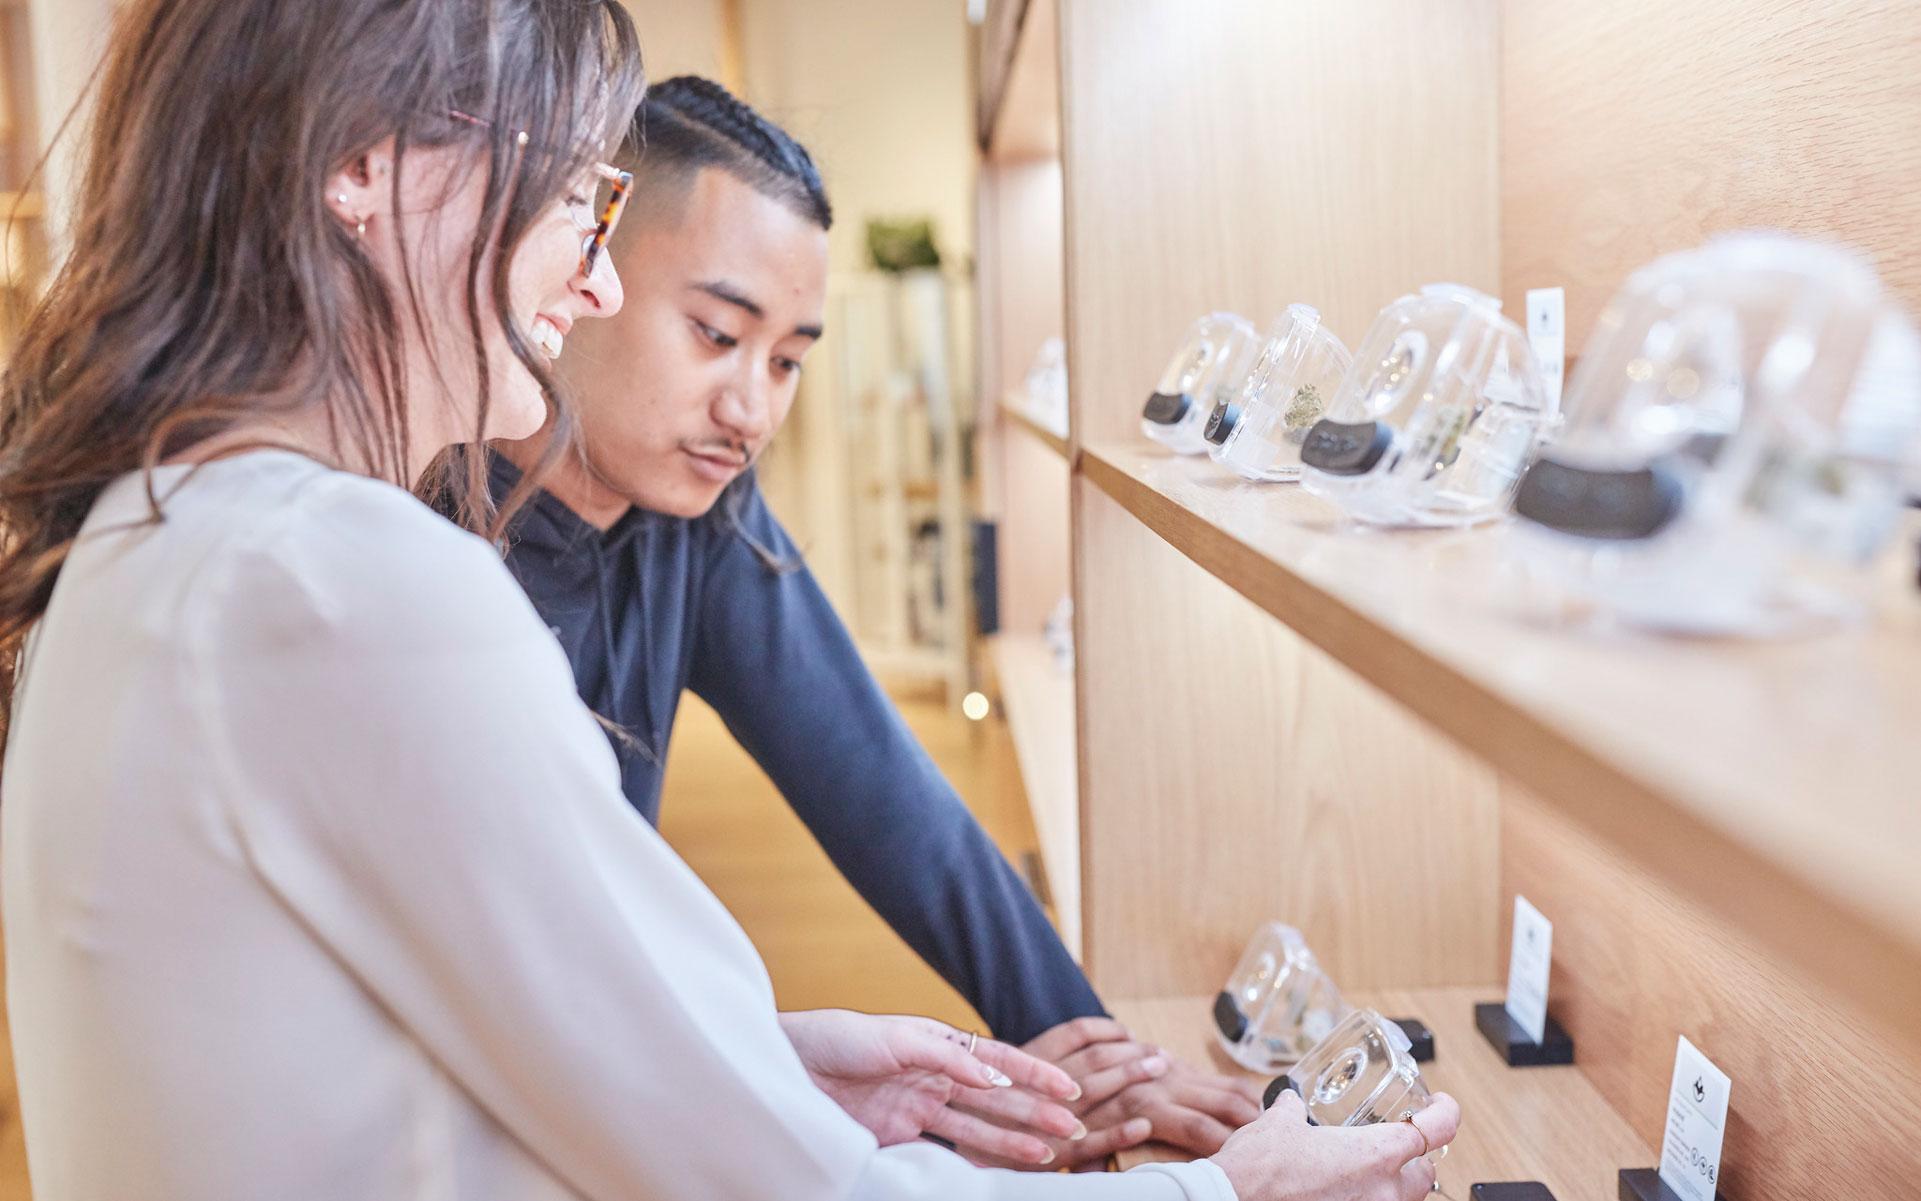 Leafly best budtenders; budtender helping a customer